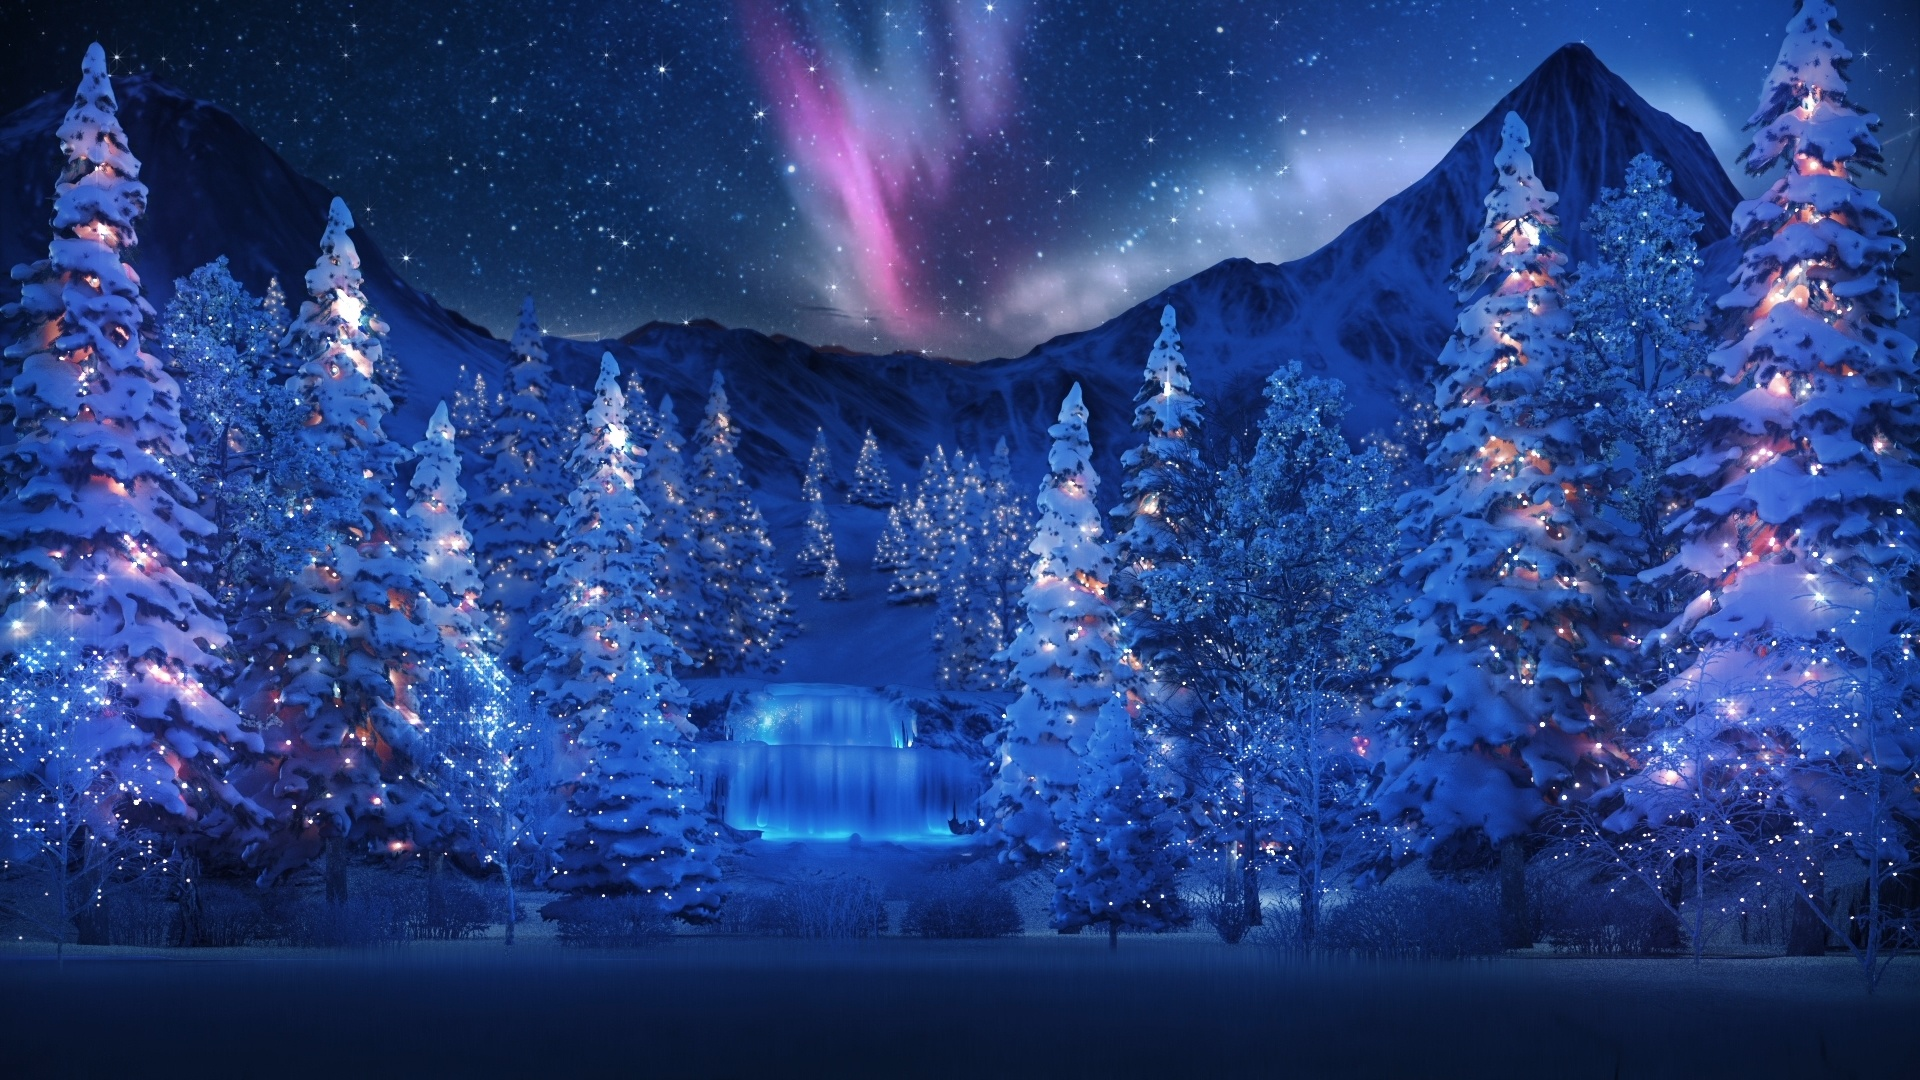 Winter New Year's Evening Wallpaper